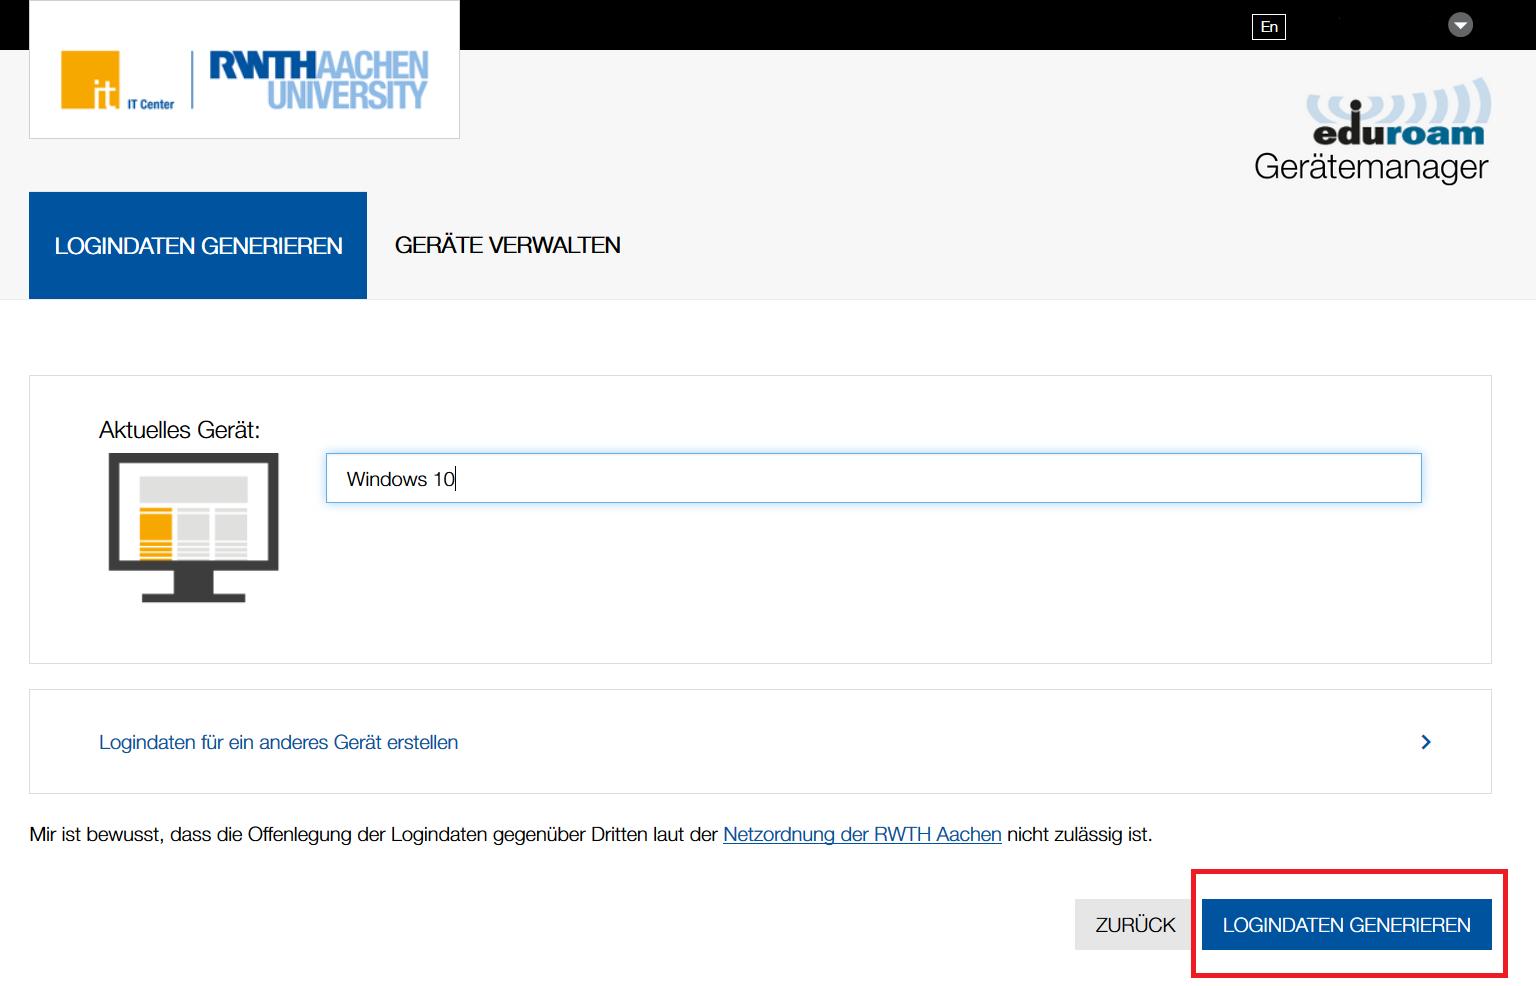 eduroam Gerätemanager 8 Logindaten generieren: